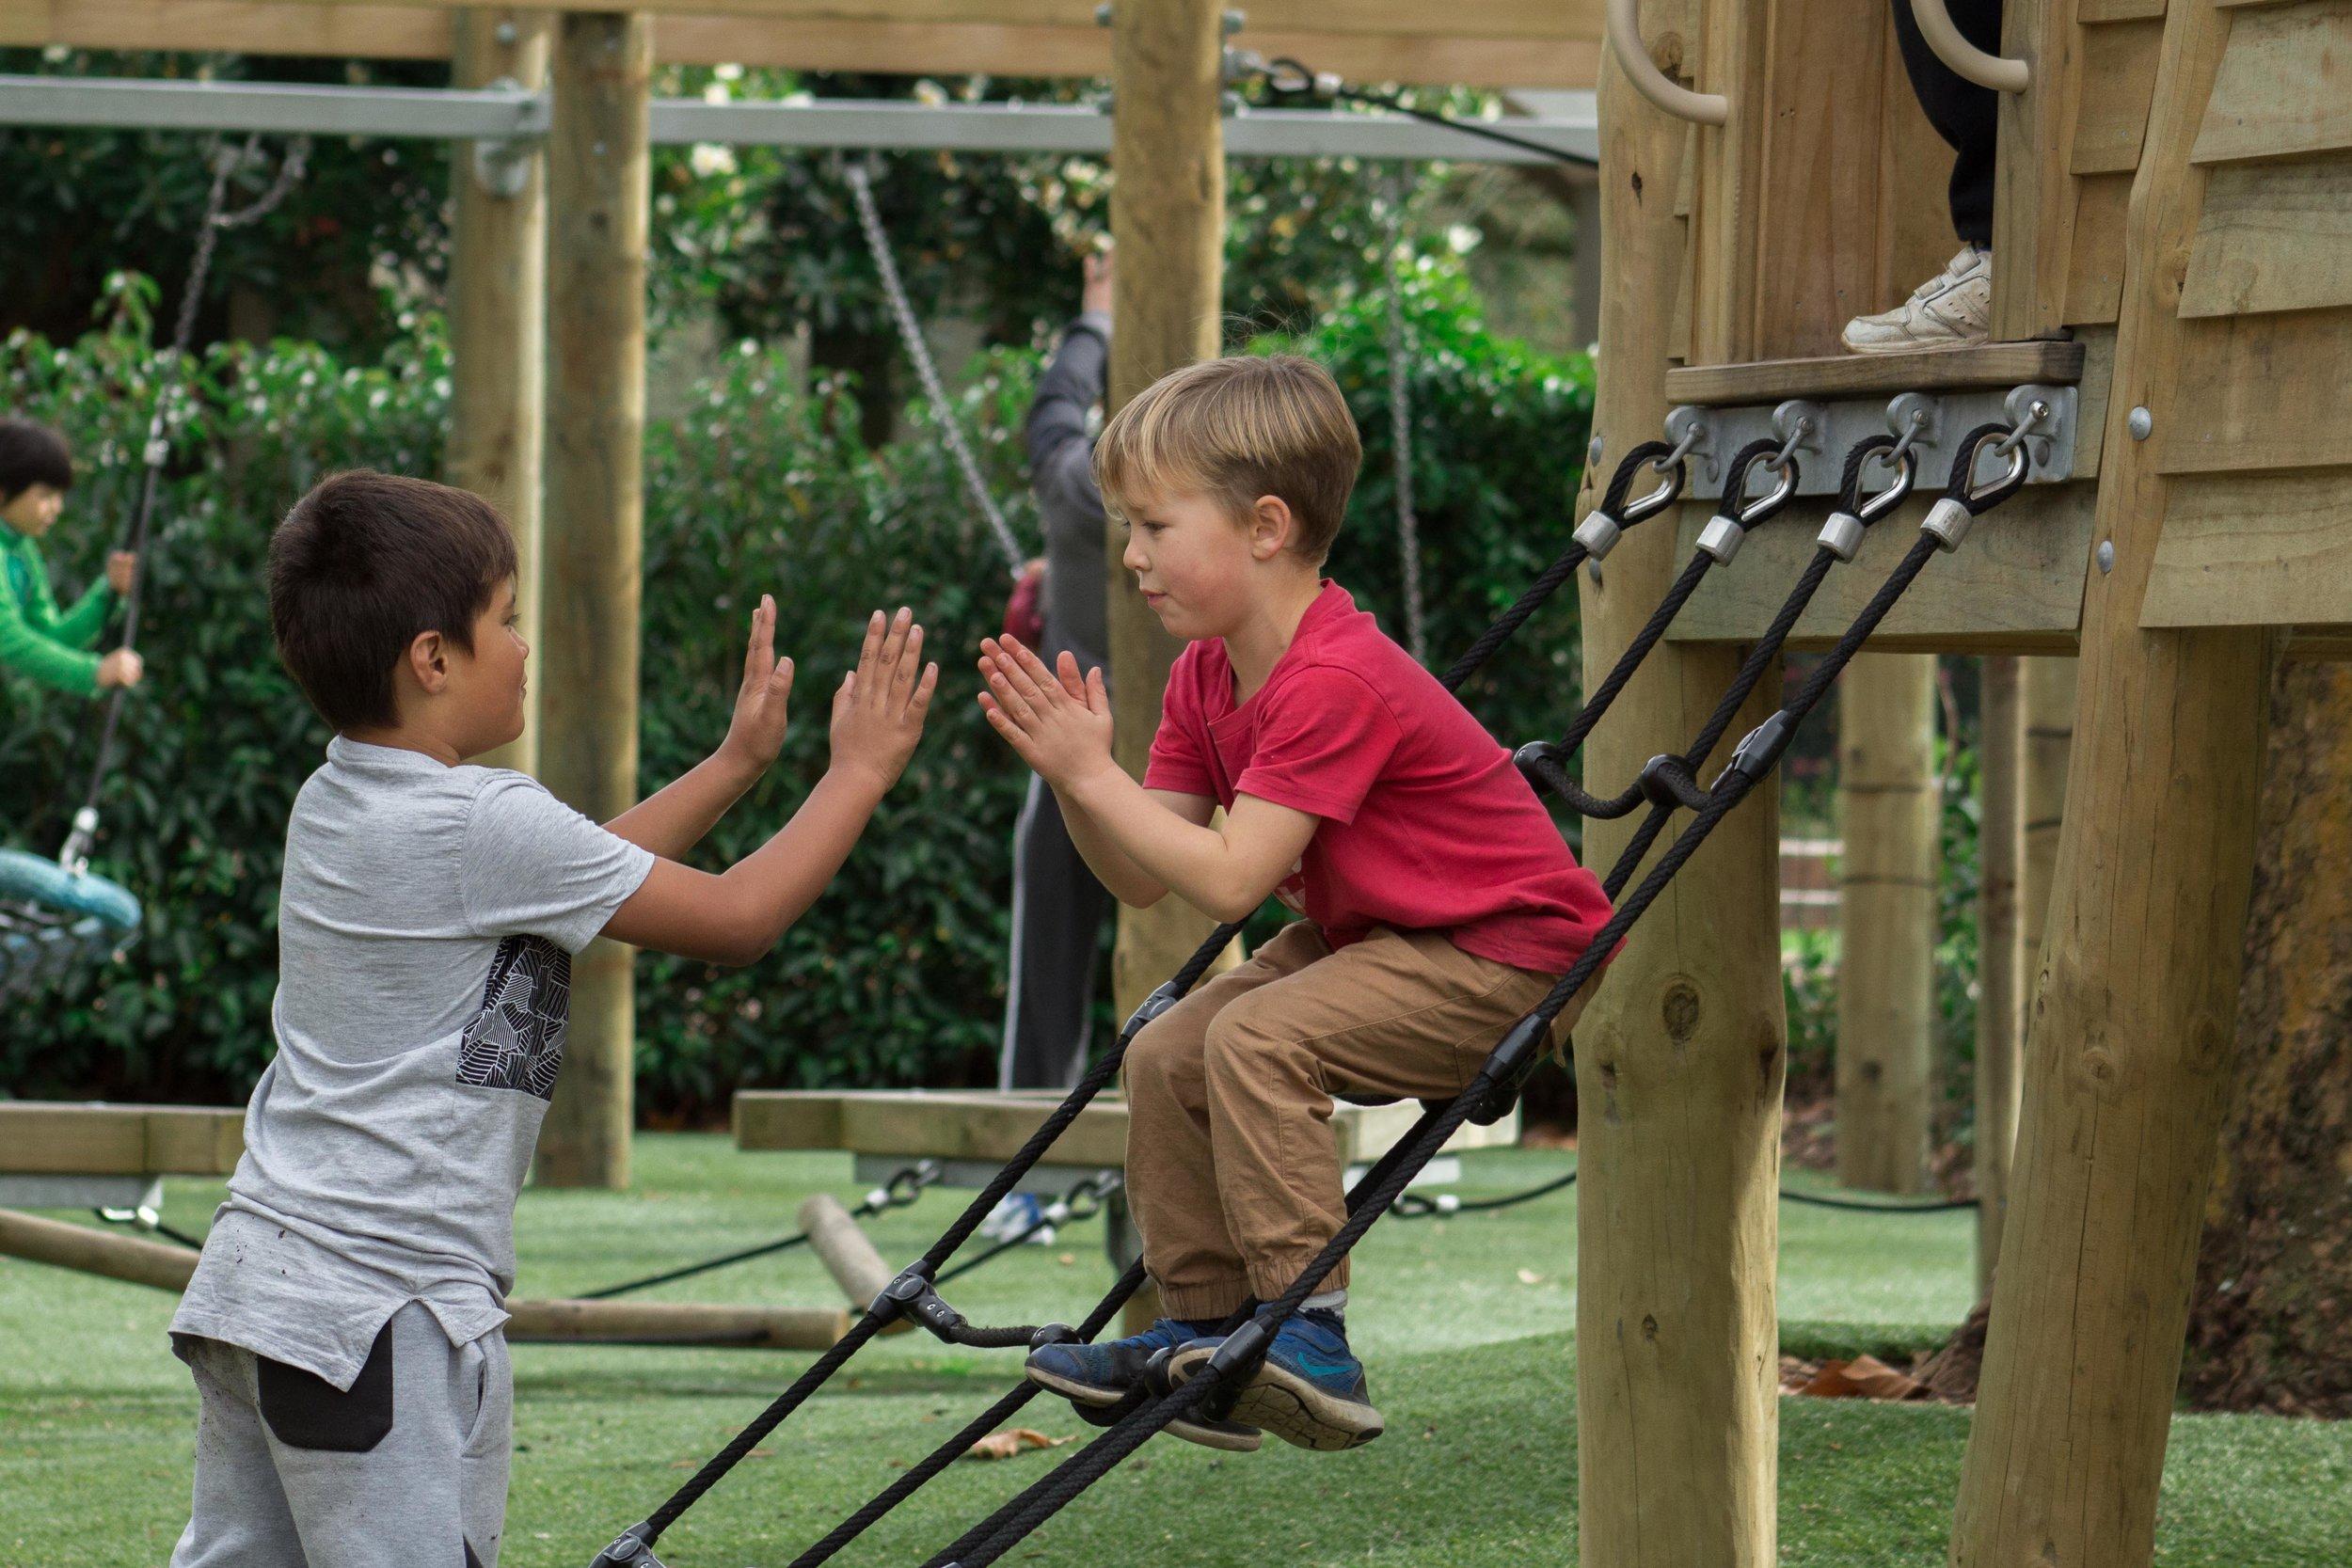 TePunaTaiao-HamiltonGardens(playground)-HighRes-7709.jpg